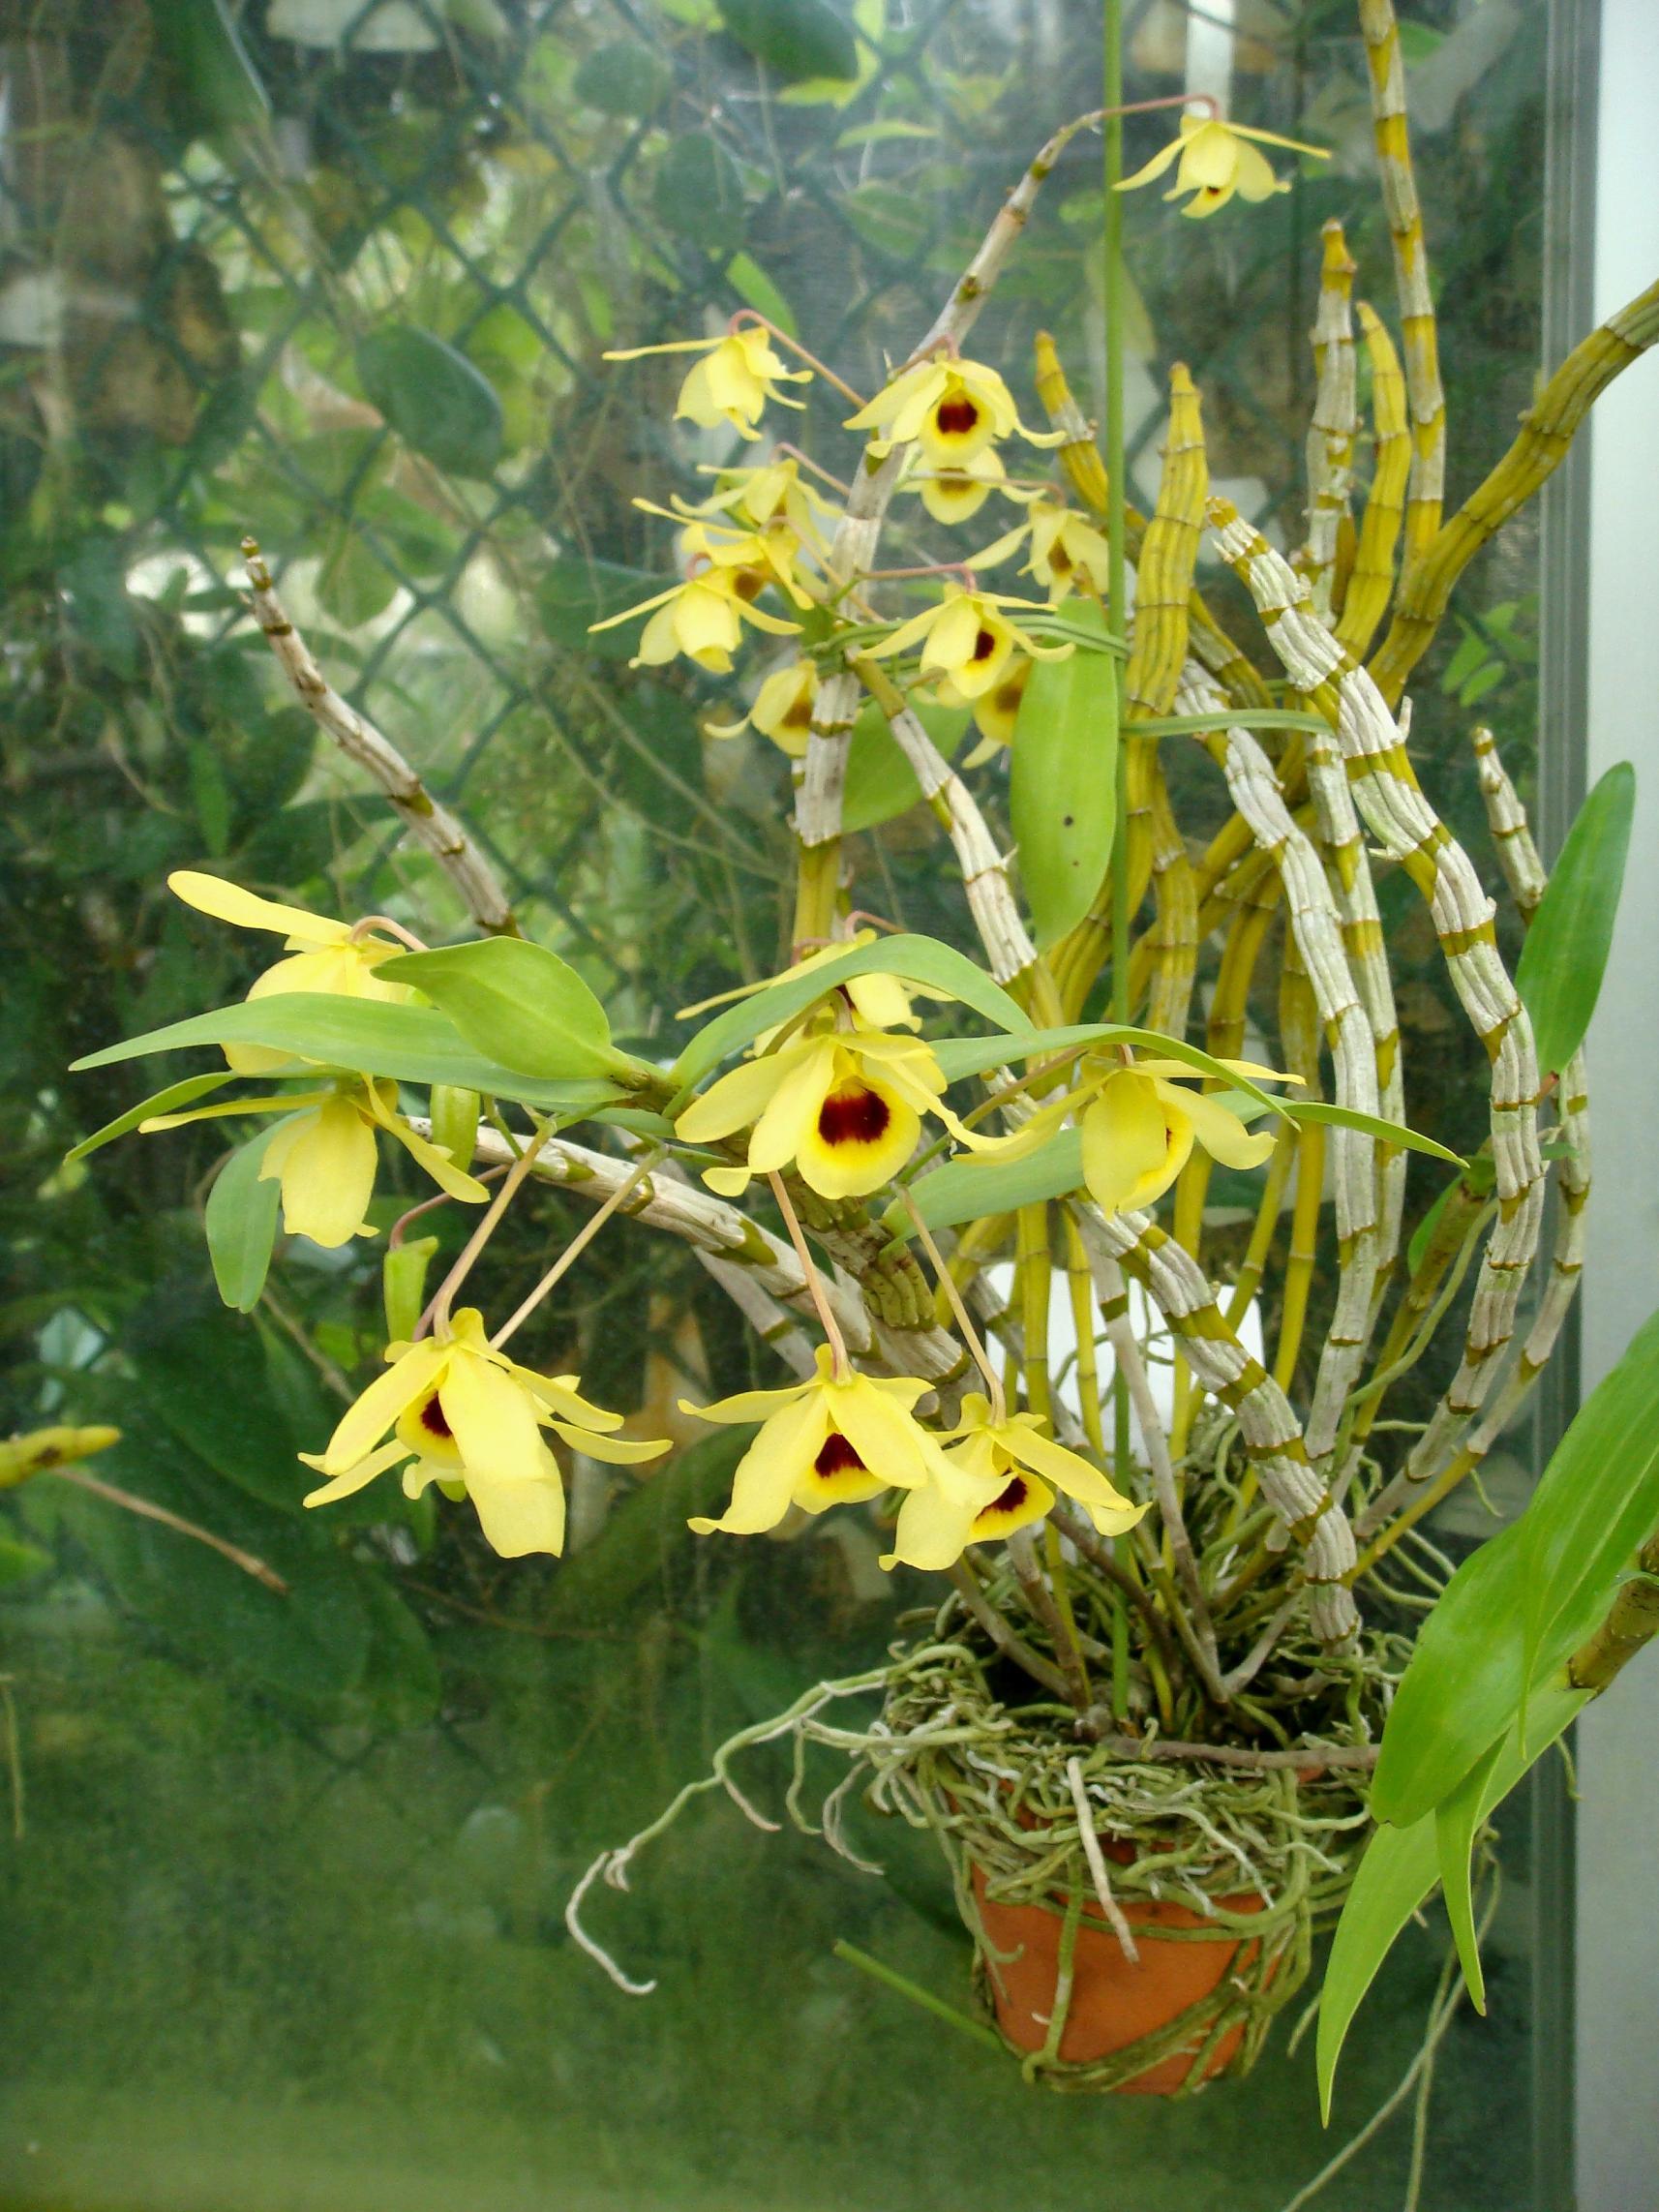 http://orchids.la.coocan.jp/Dendrobium/Dendrobium%20friedericksianum/DSC08573.JPG